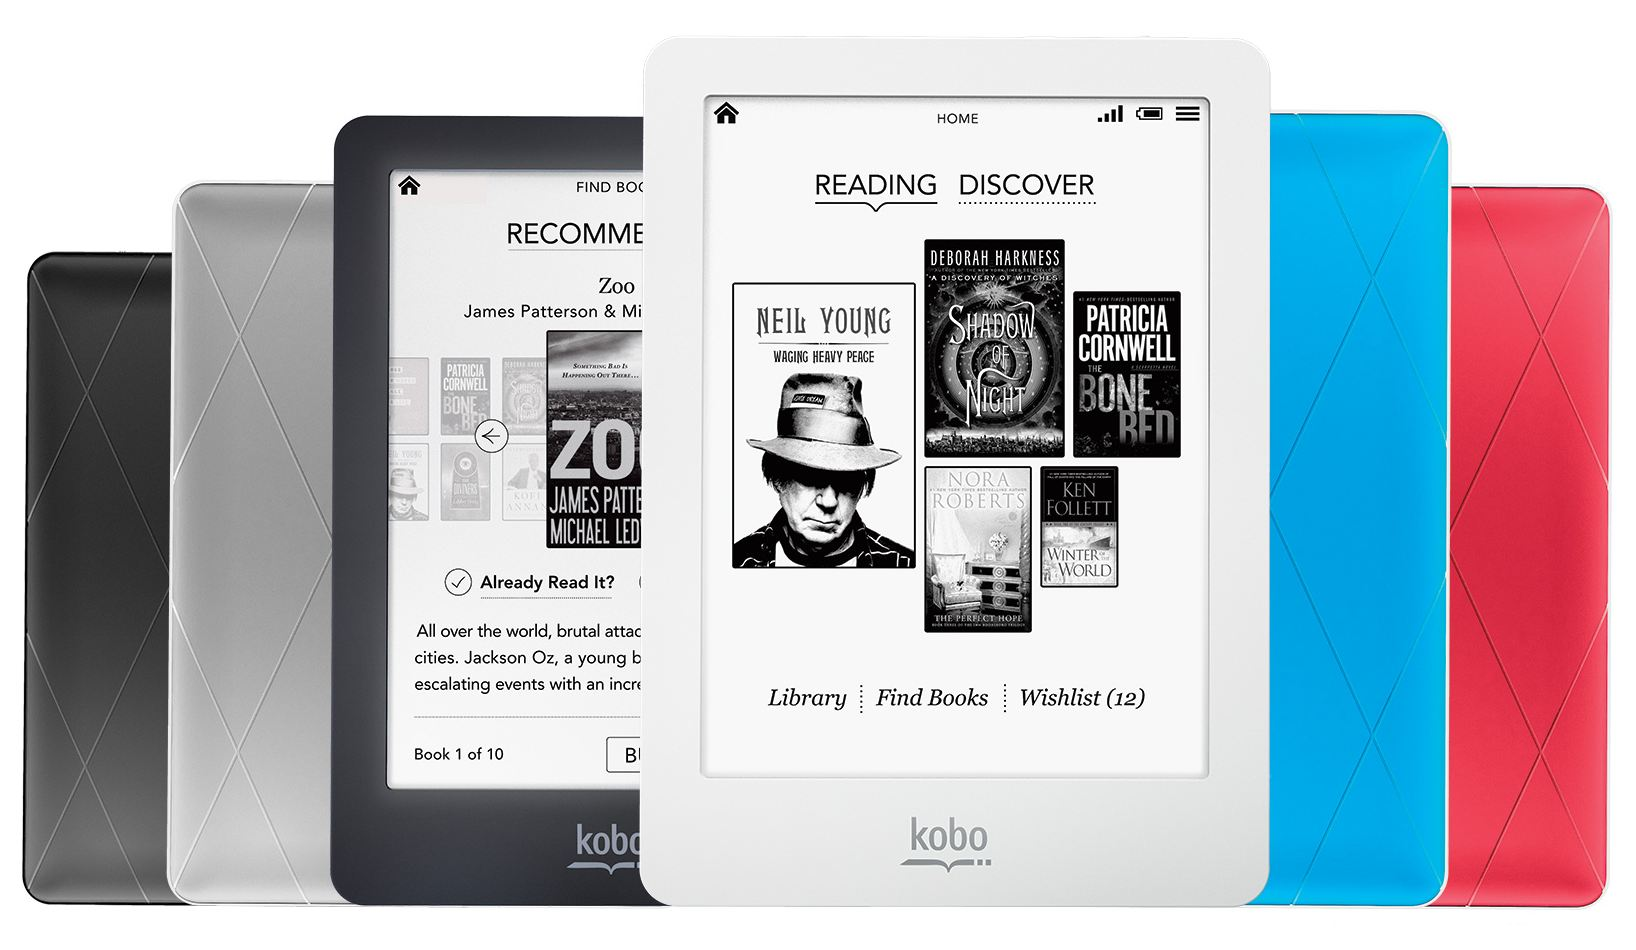 'Groei e-books tot stilstand gekomen', Hans van der klis, MediaFacts